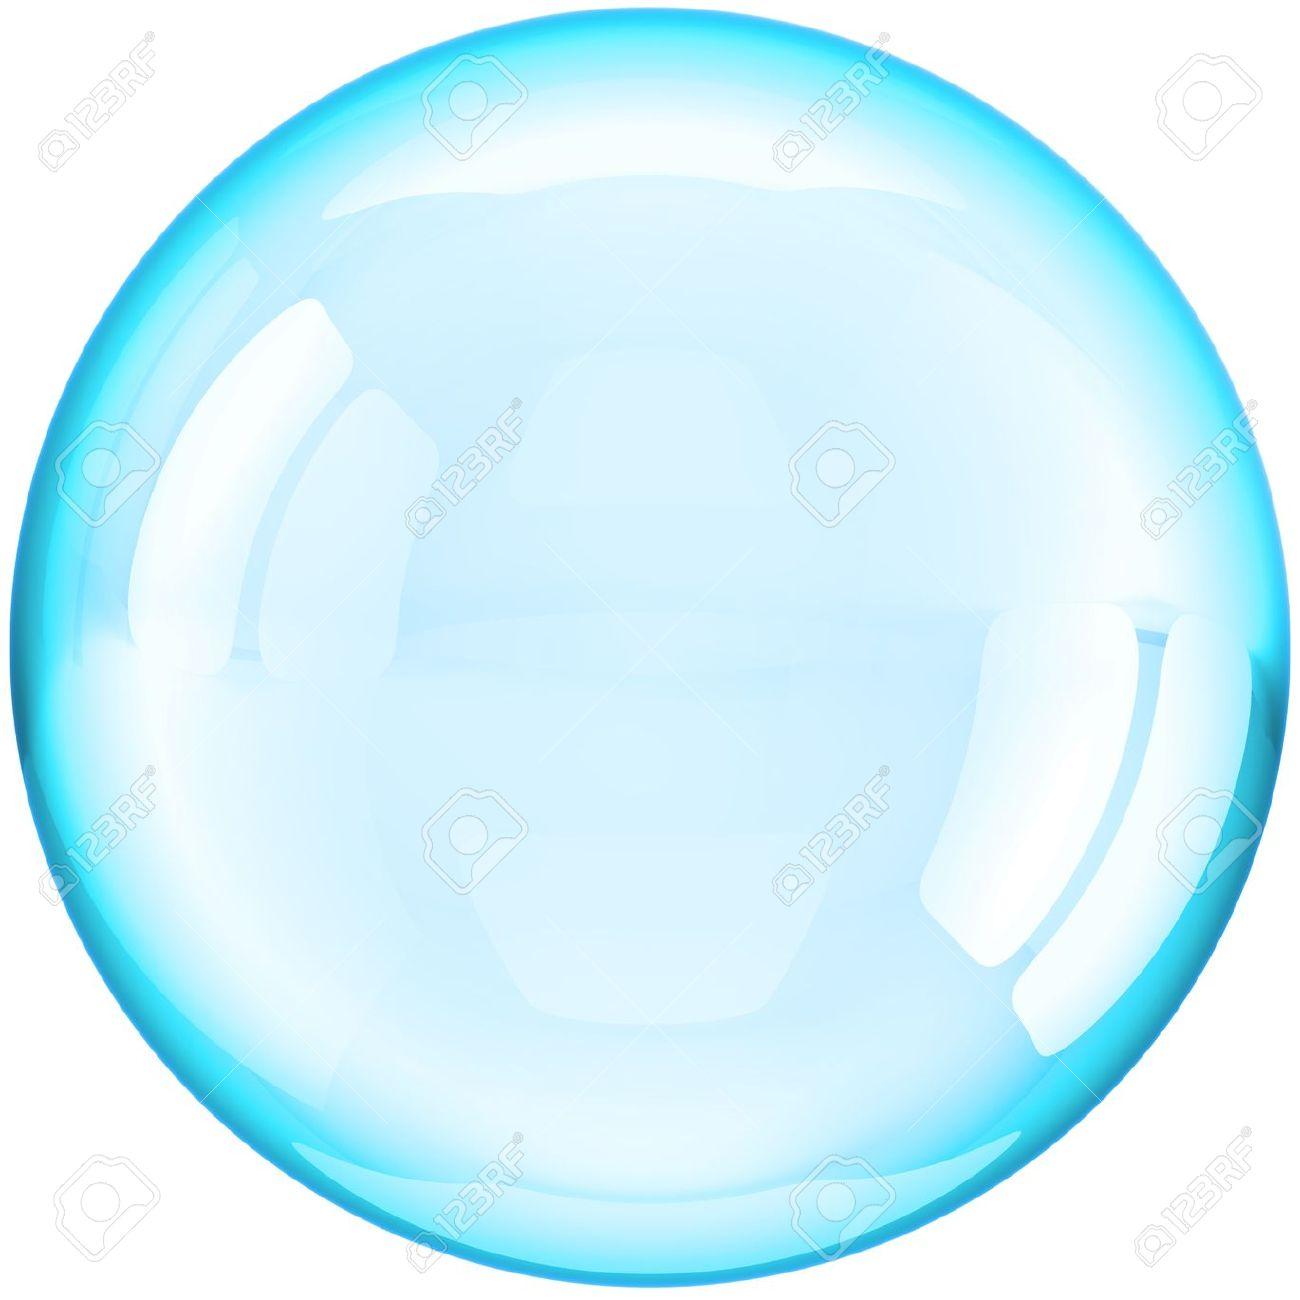 SOAP Bubble Ball Durchsichtig Farbig Cyan Blau. Dies Ist Eine.